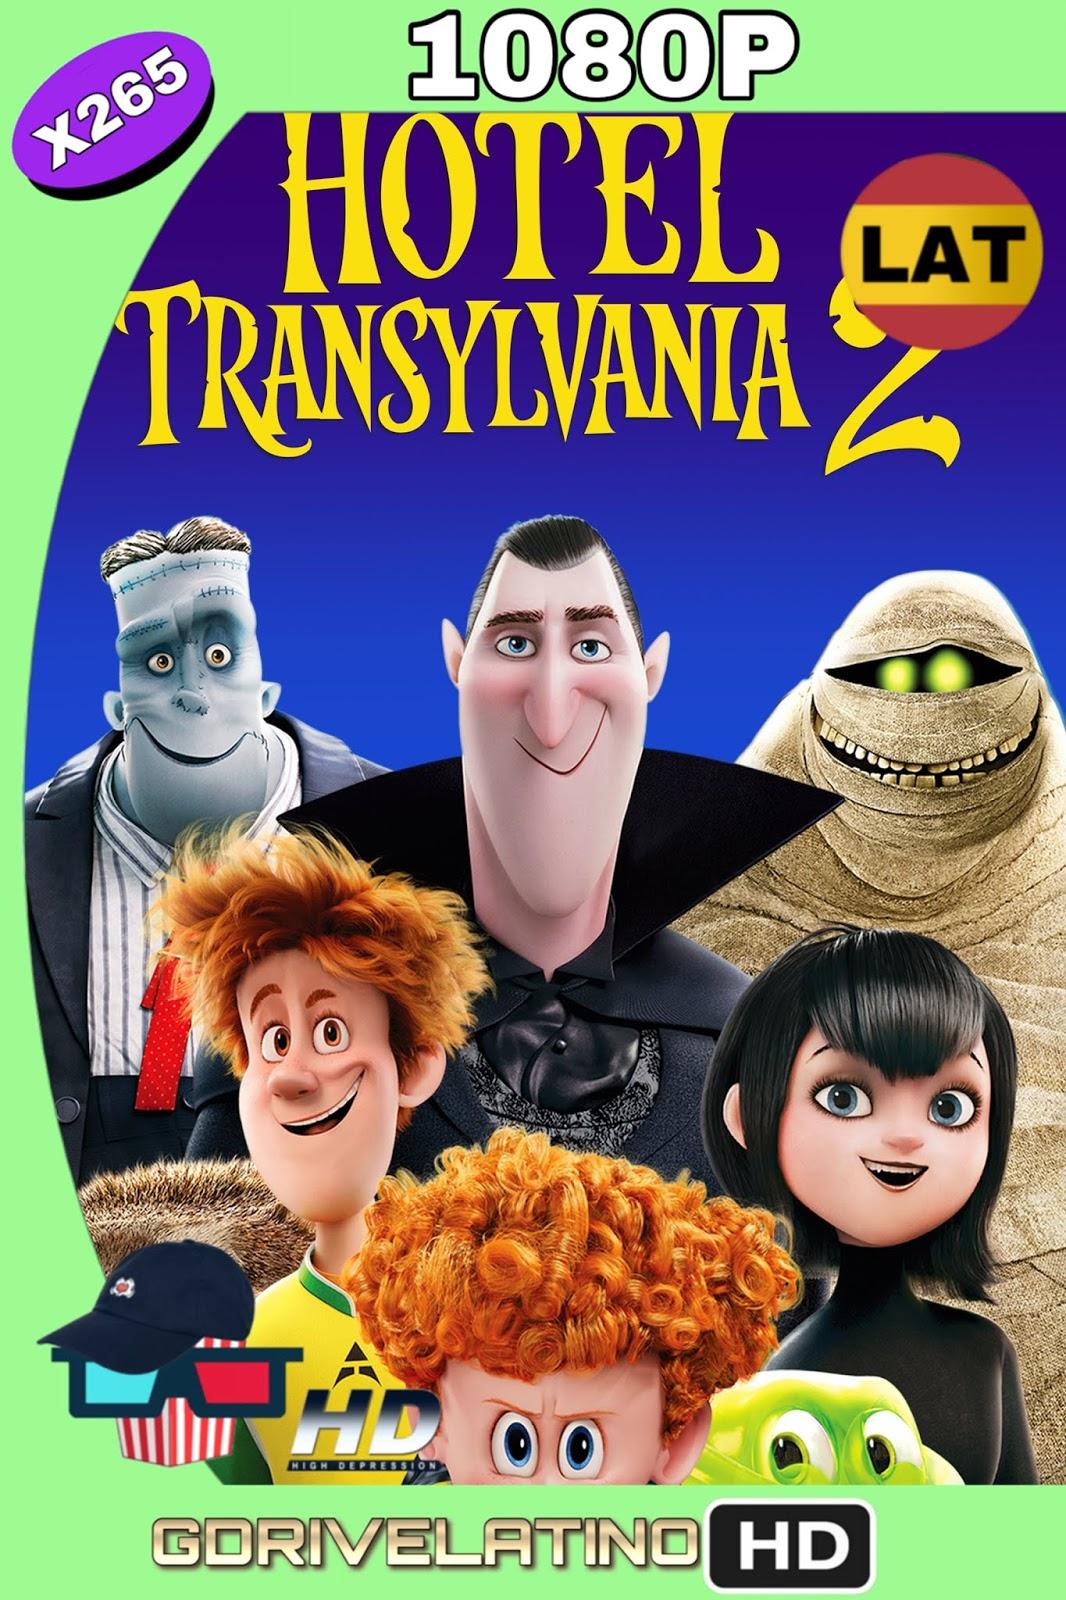 Hotel Transylvania 2 (2015) BDRip FULL 1080p ( HEVC x265) (Latino-Inglés) MKV